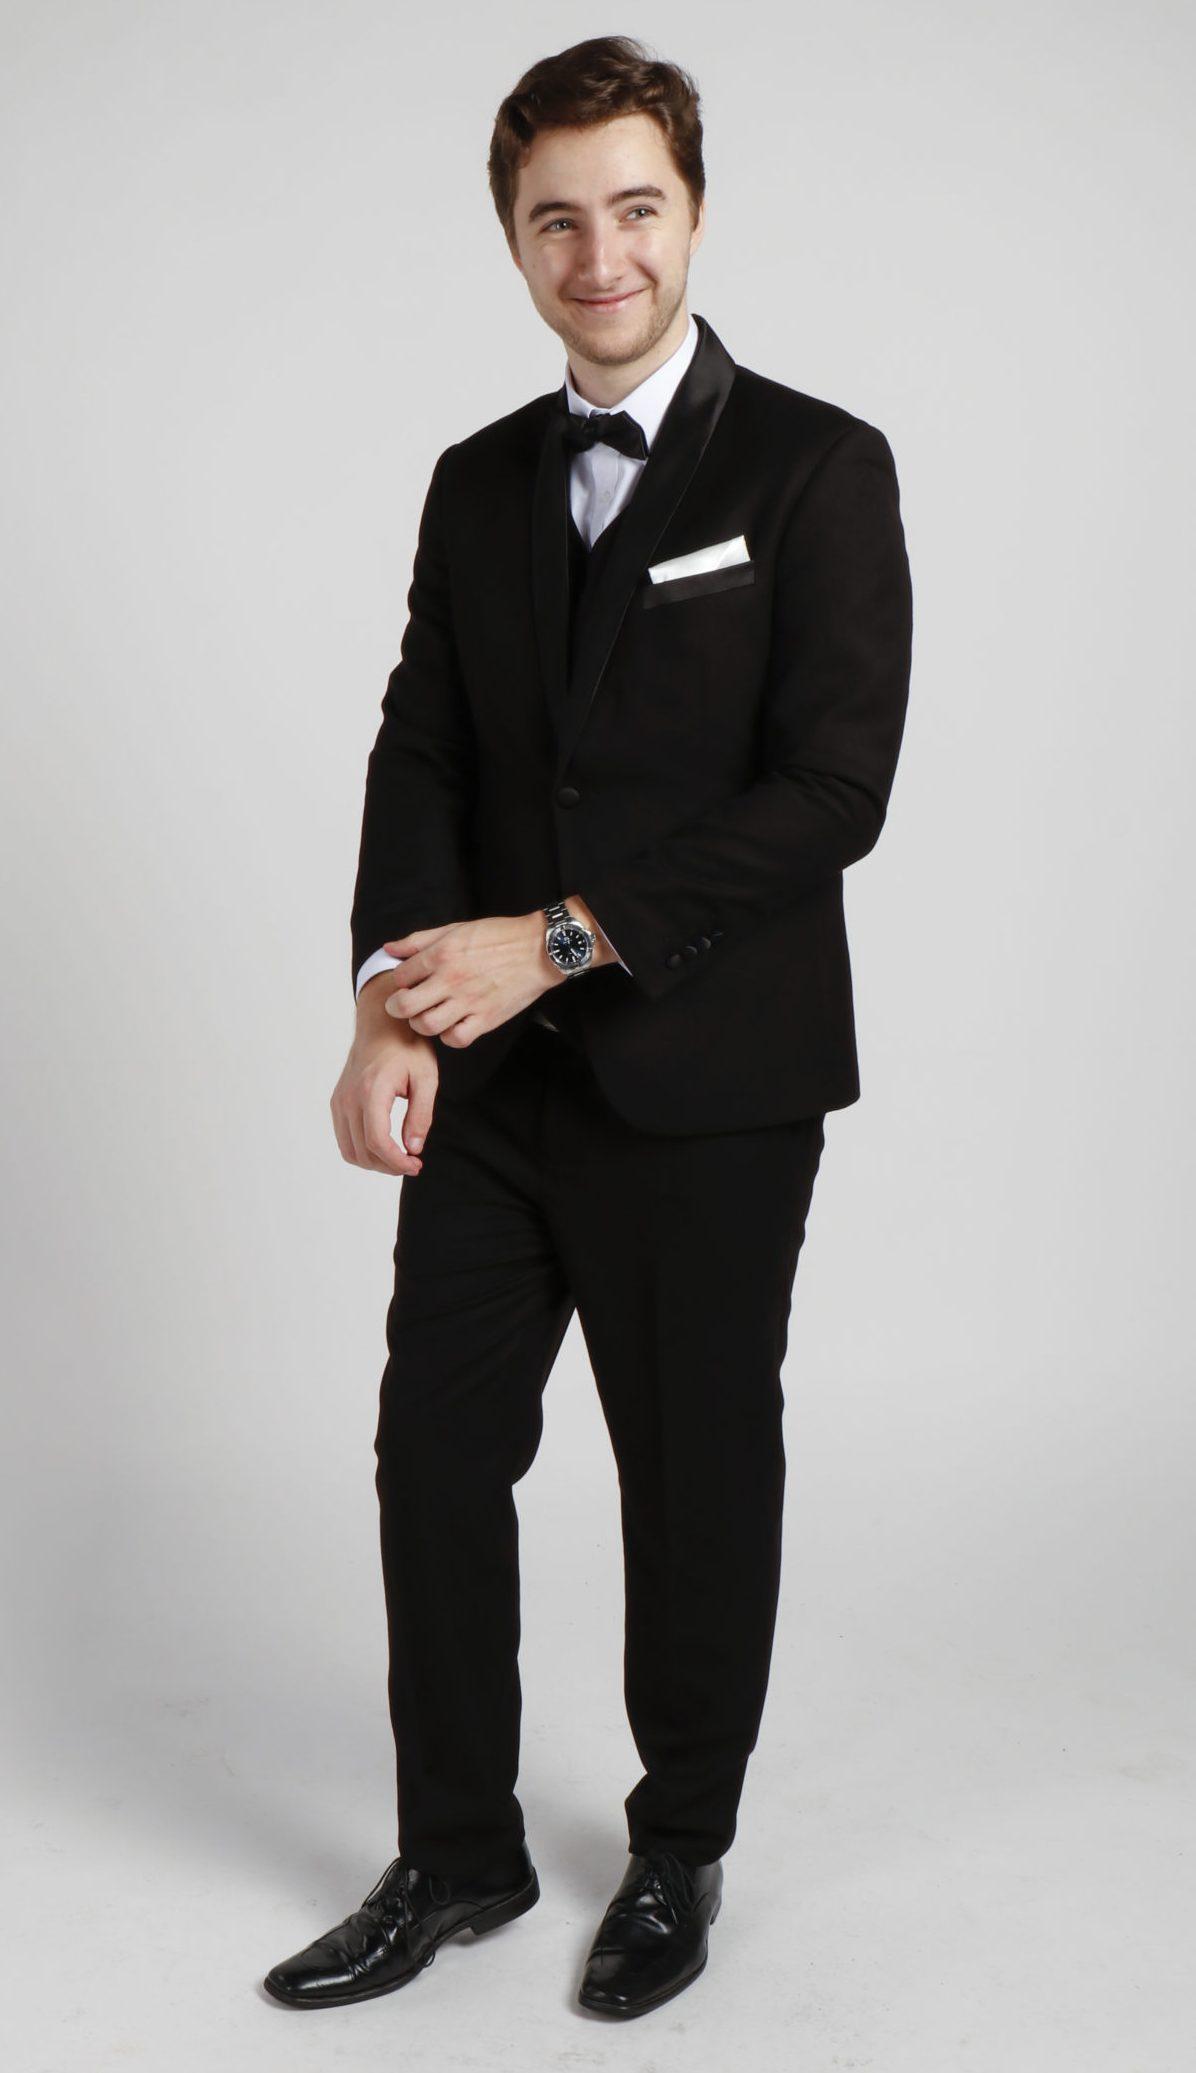 Black Tuxedo Hire